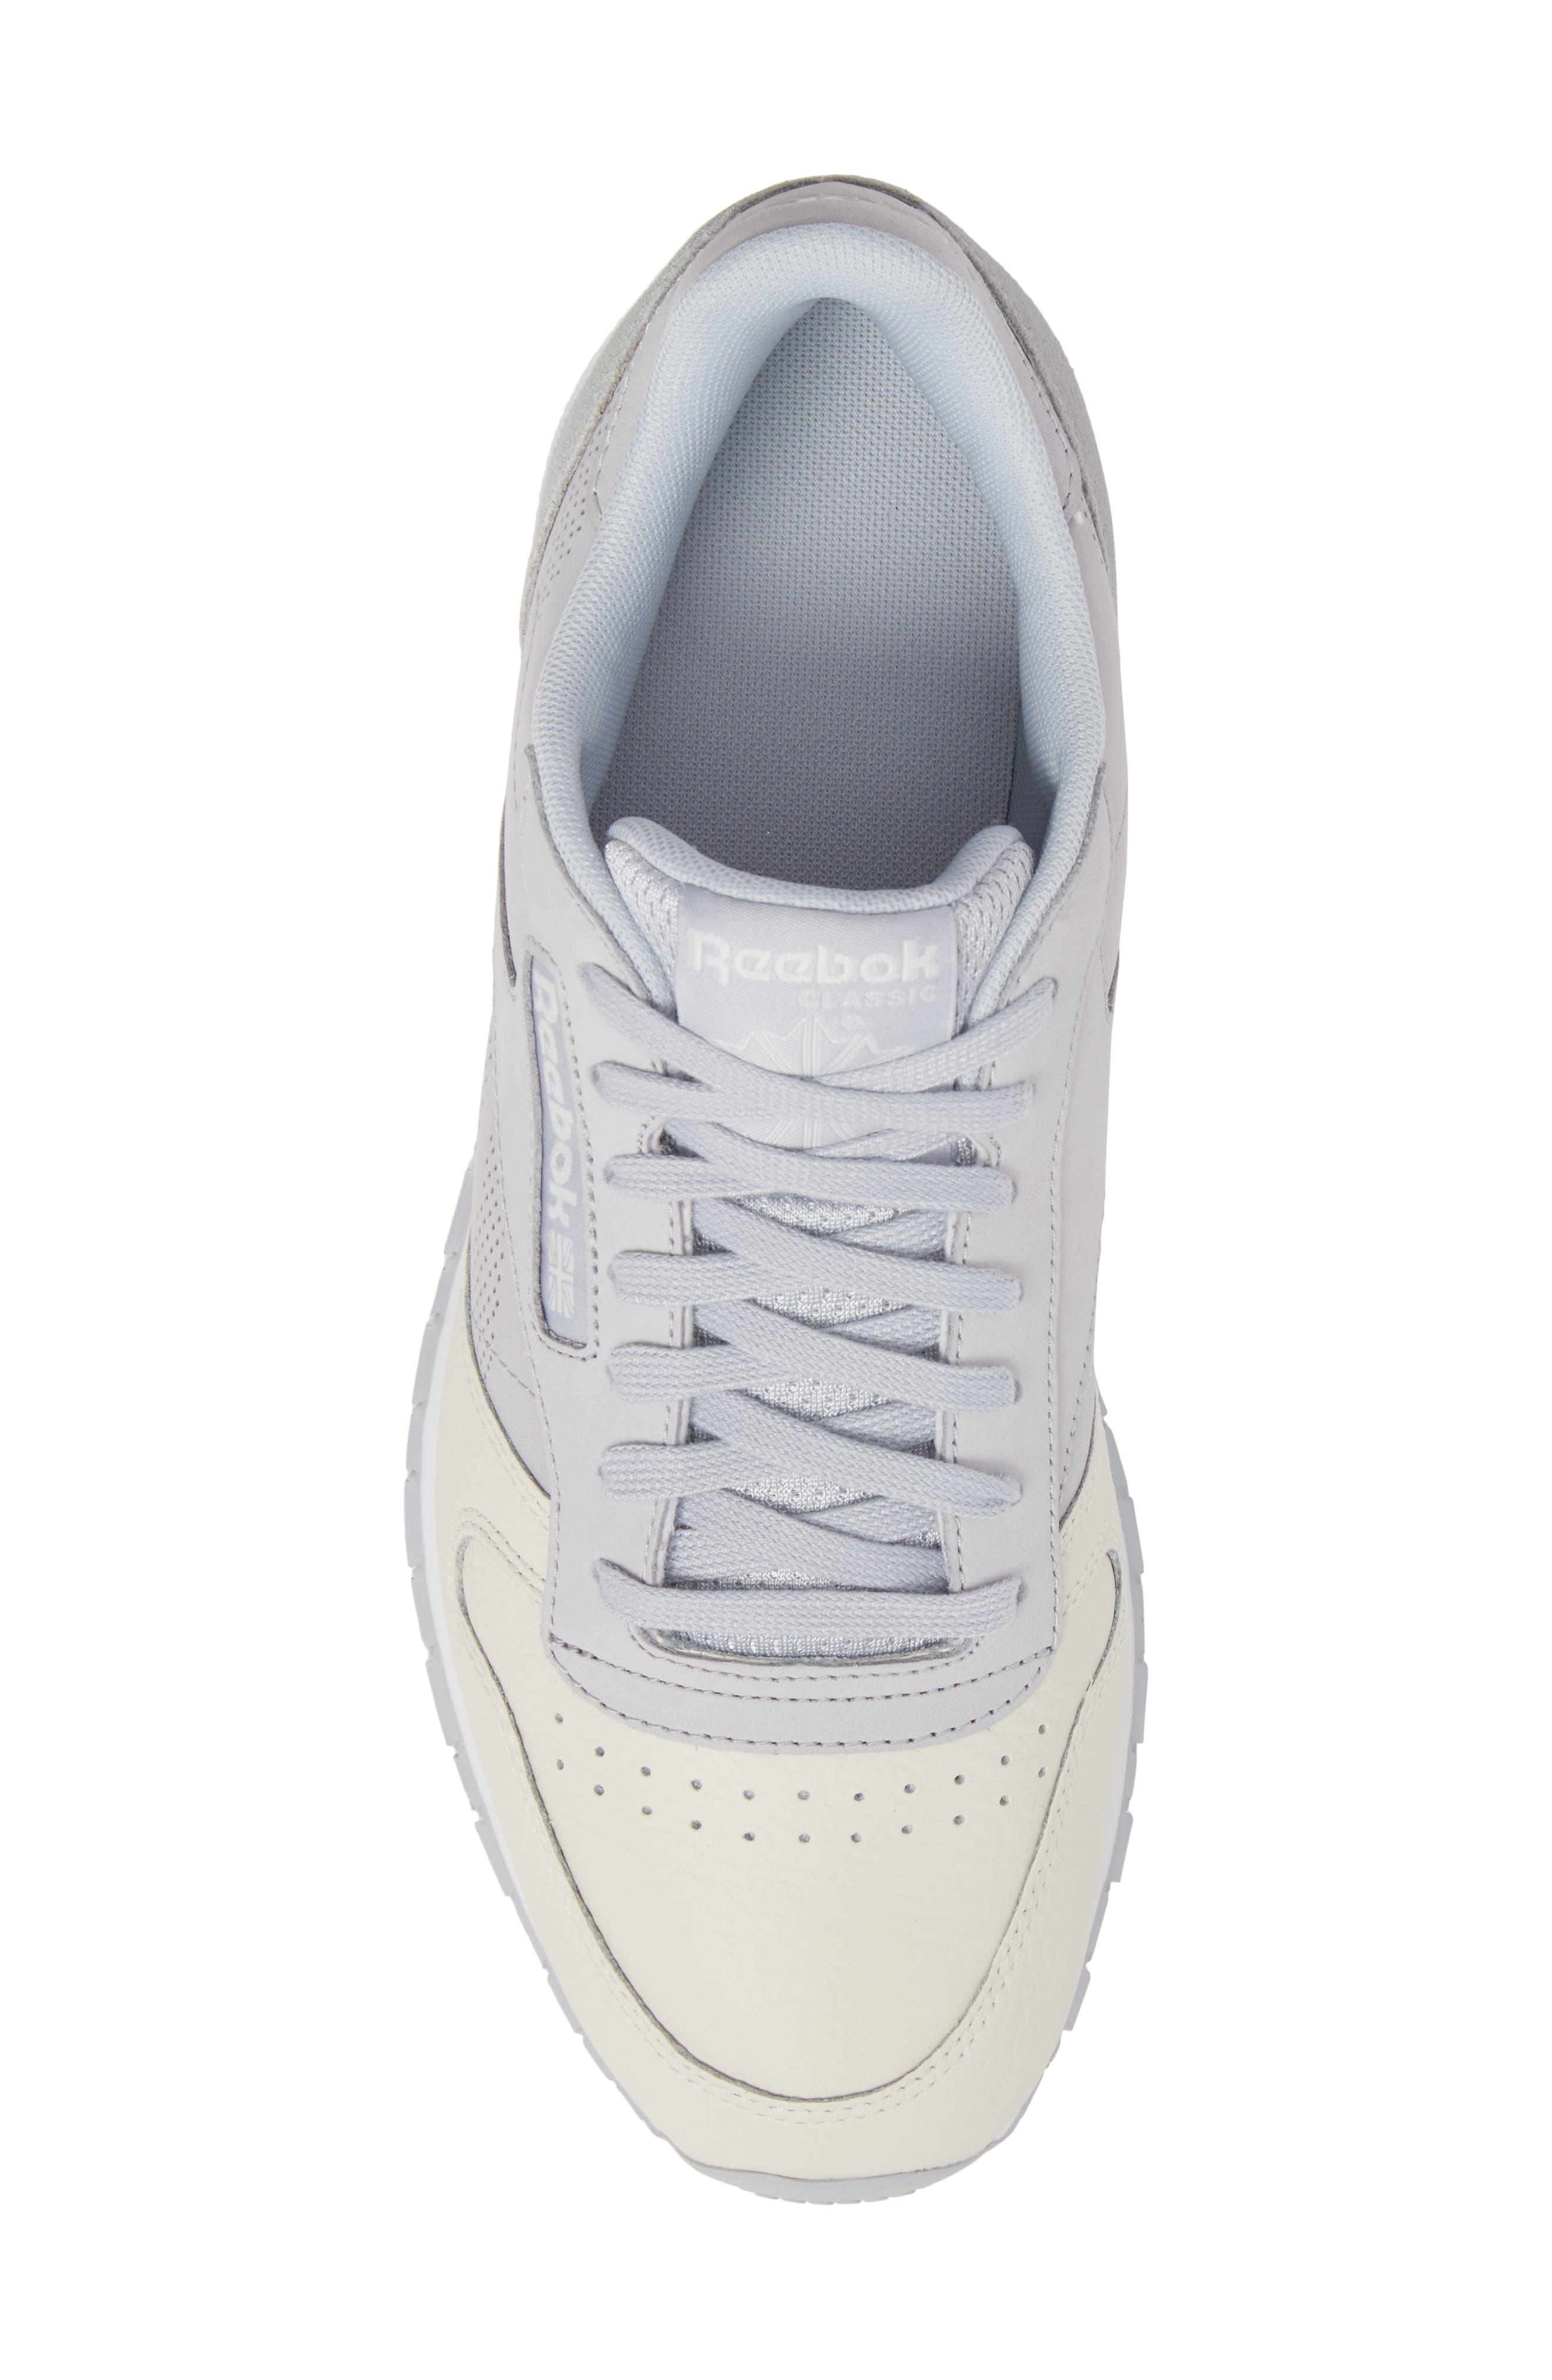 Classic Leather UE Sneaker,                             Alternate thumbnail 5, color,                             Grey/ Chalk/ Stark Grey/ White